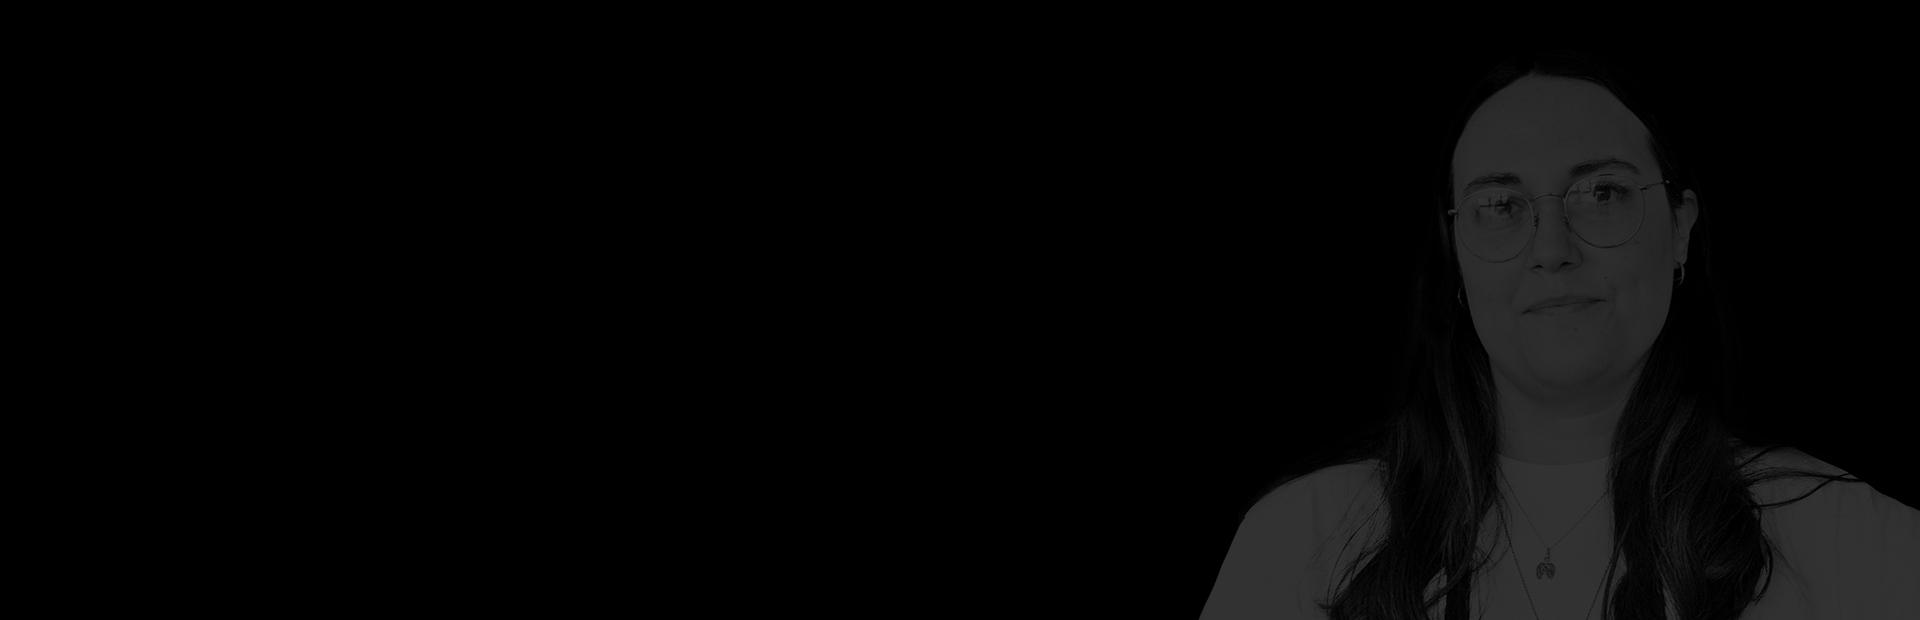 Mariangela Napolitano – Social Advice